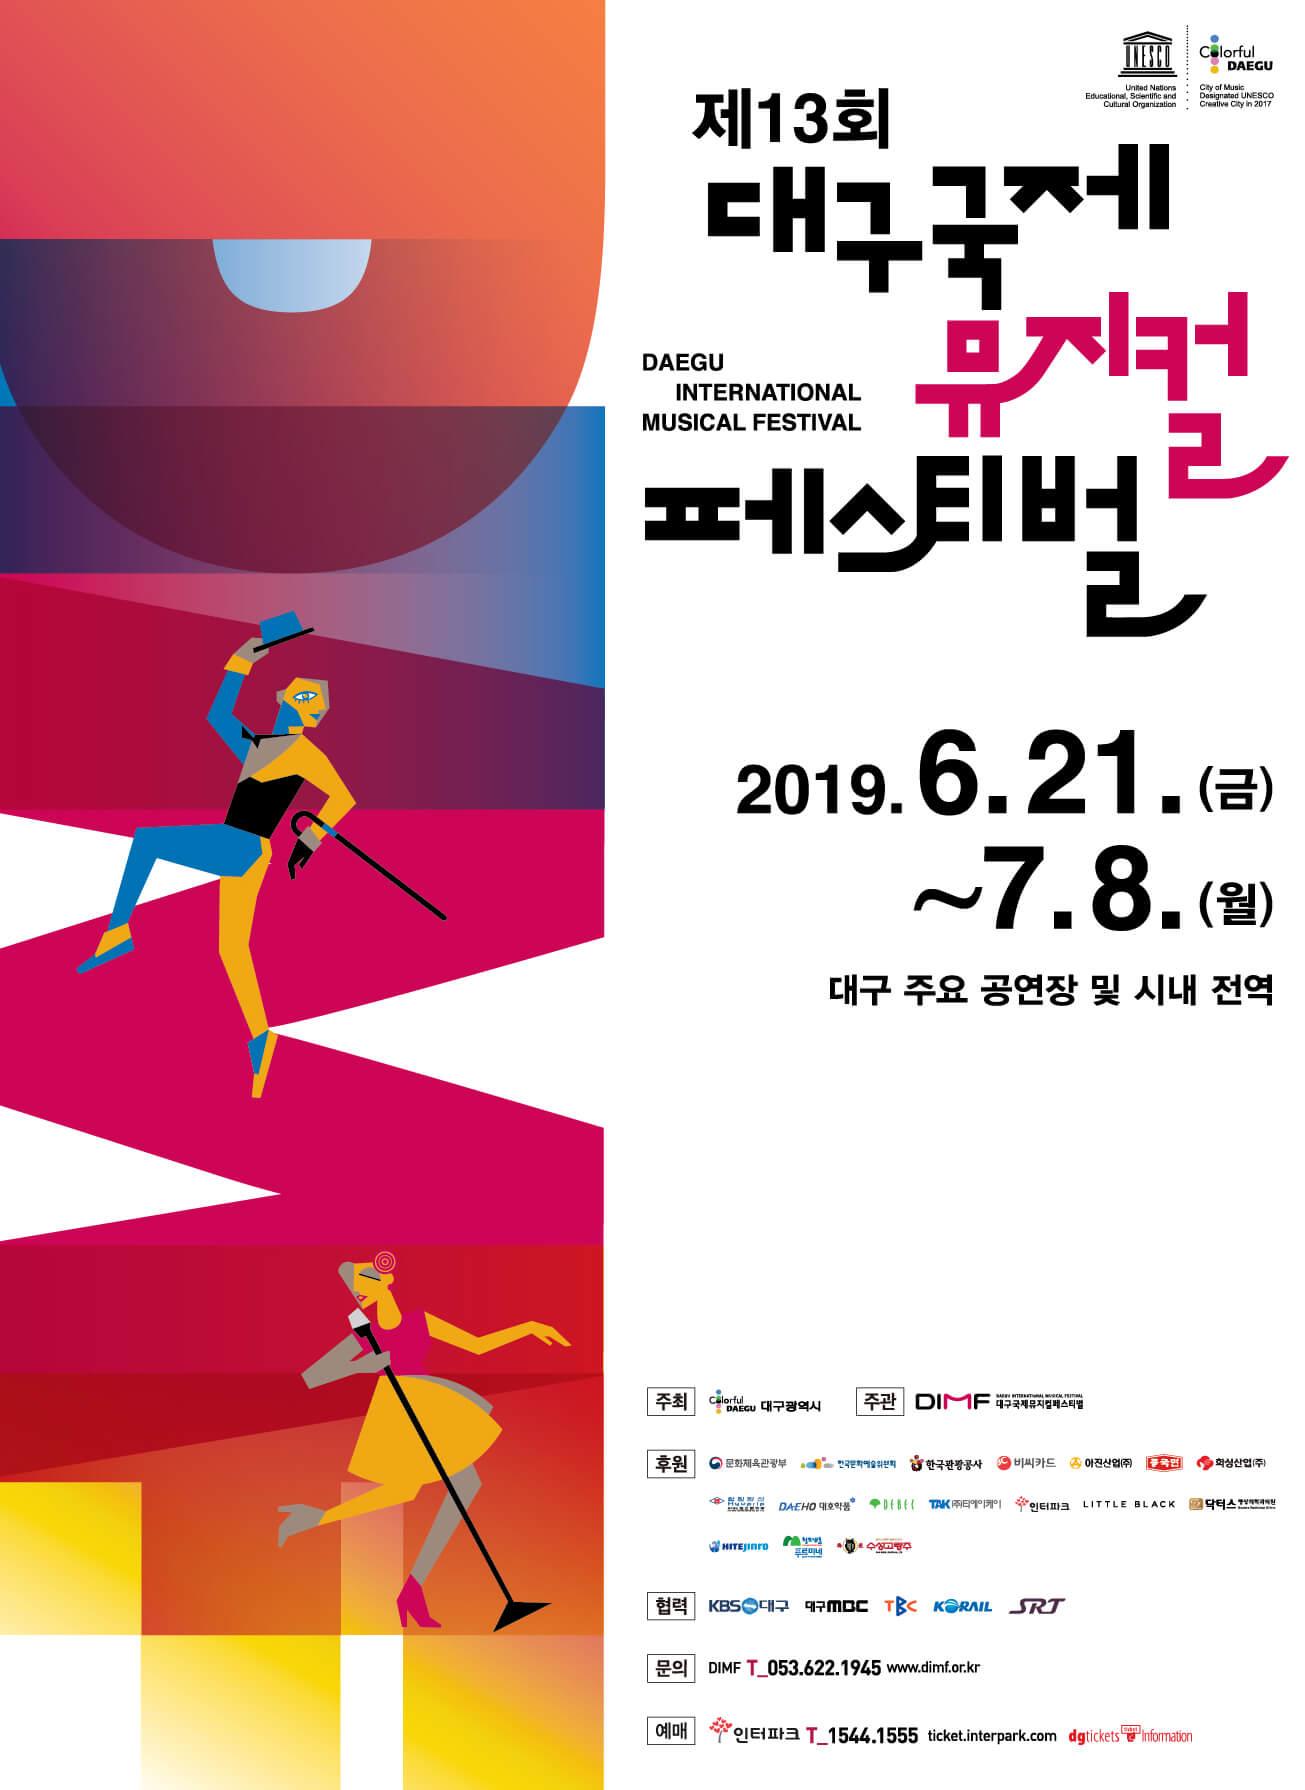 Daegu International Music Festival 2019